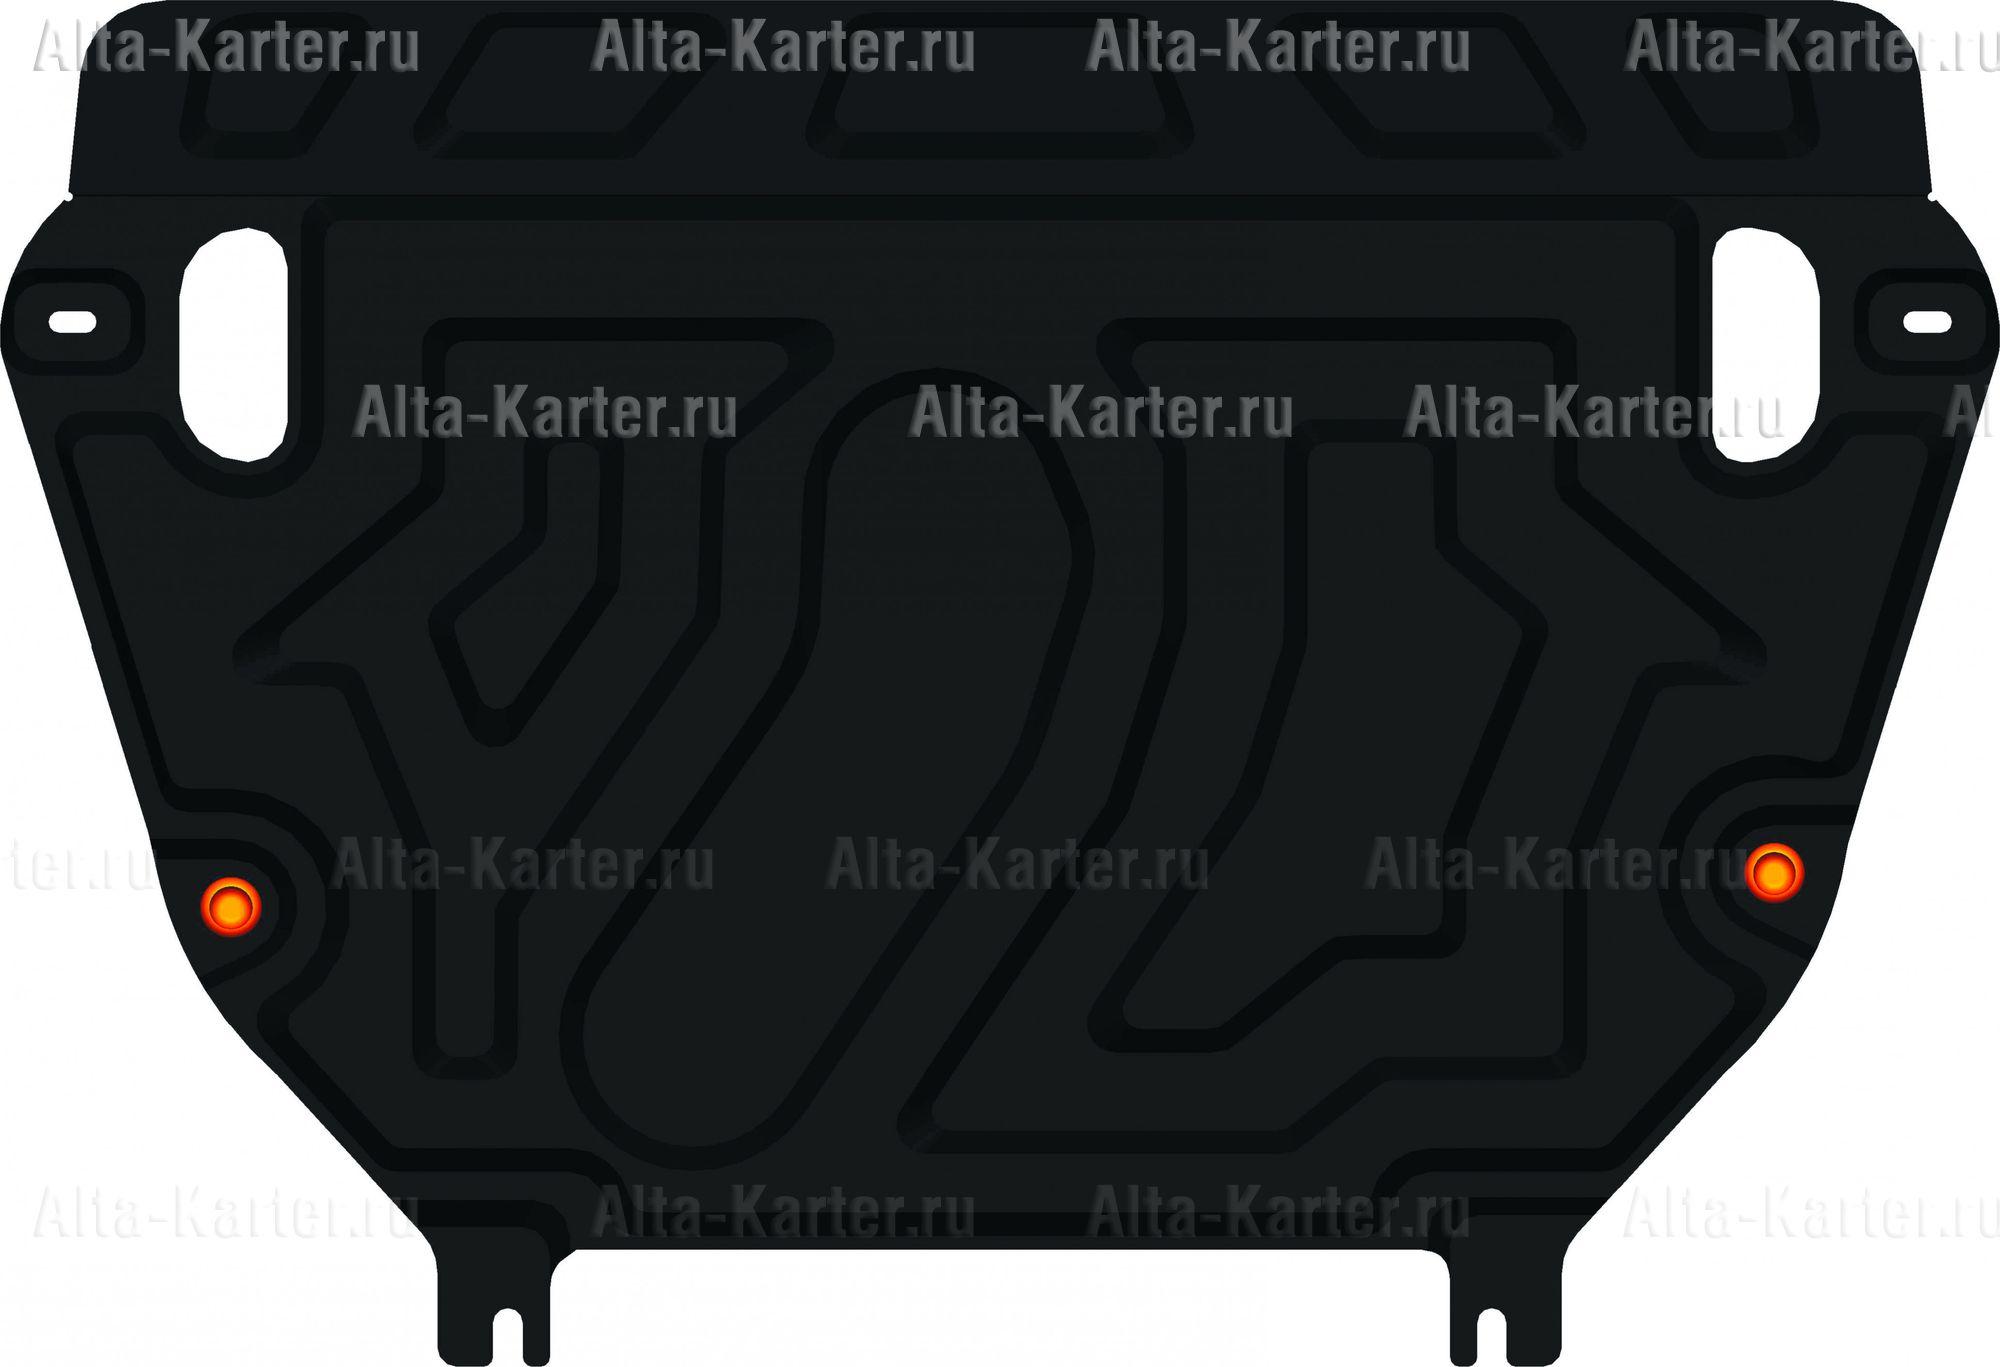 Защита Alfeco для картера и КПП Toyota RAV4 IV 2013-2019. Артикул ALF.24.66 st